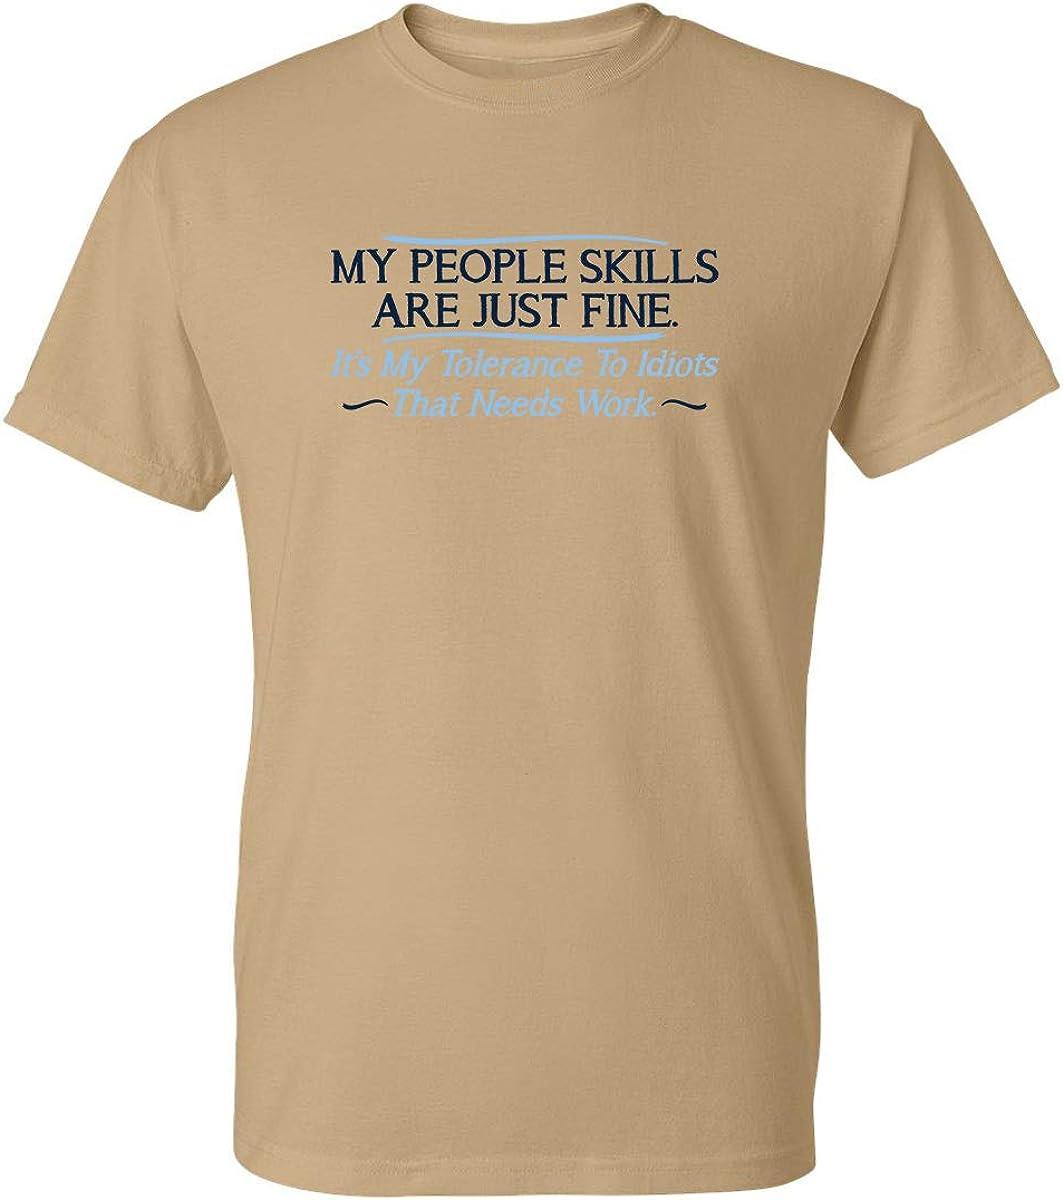 My People Skills Are Just Fine...New Funny T-shirt Joke Birthday Present Gift